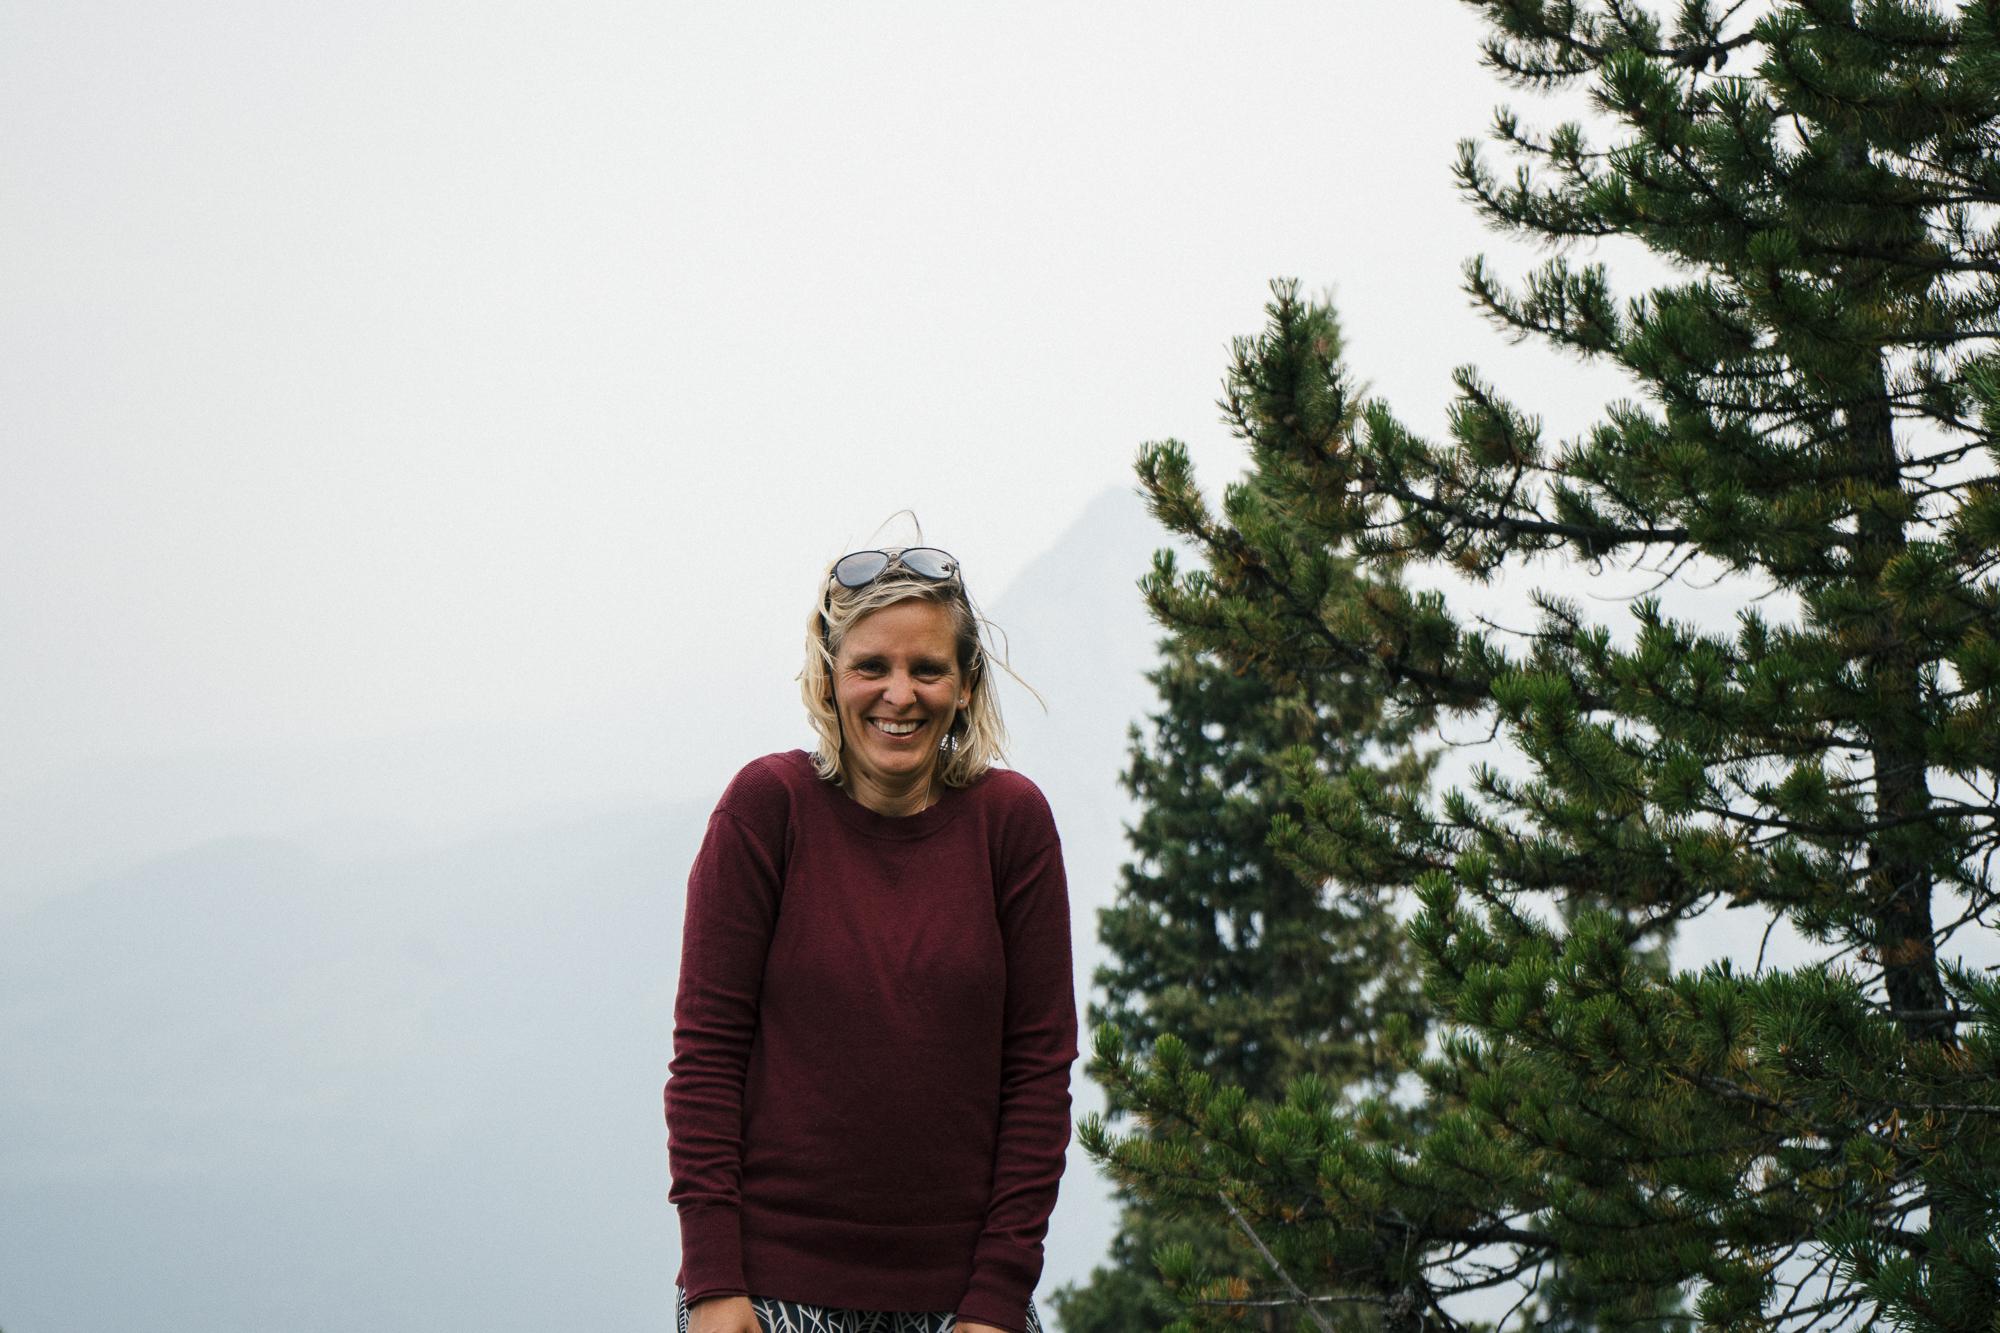 Banff-03305.jpg